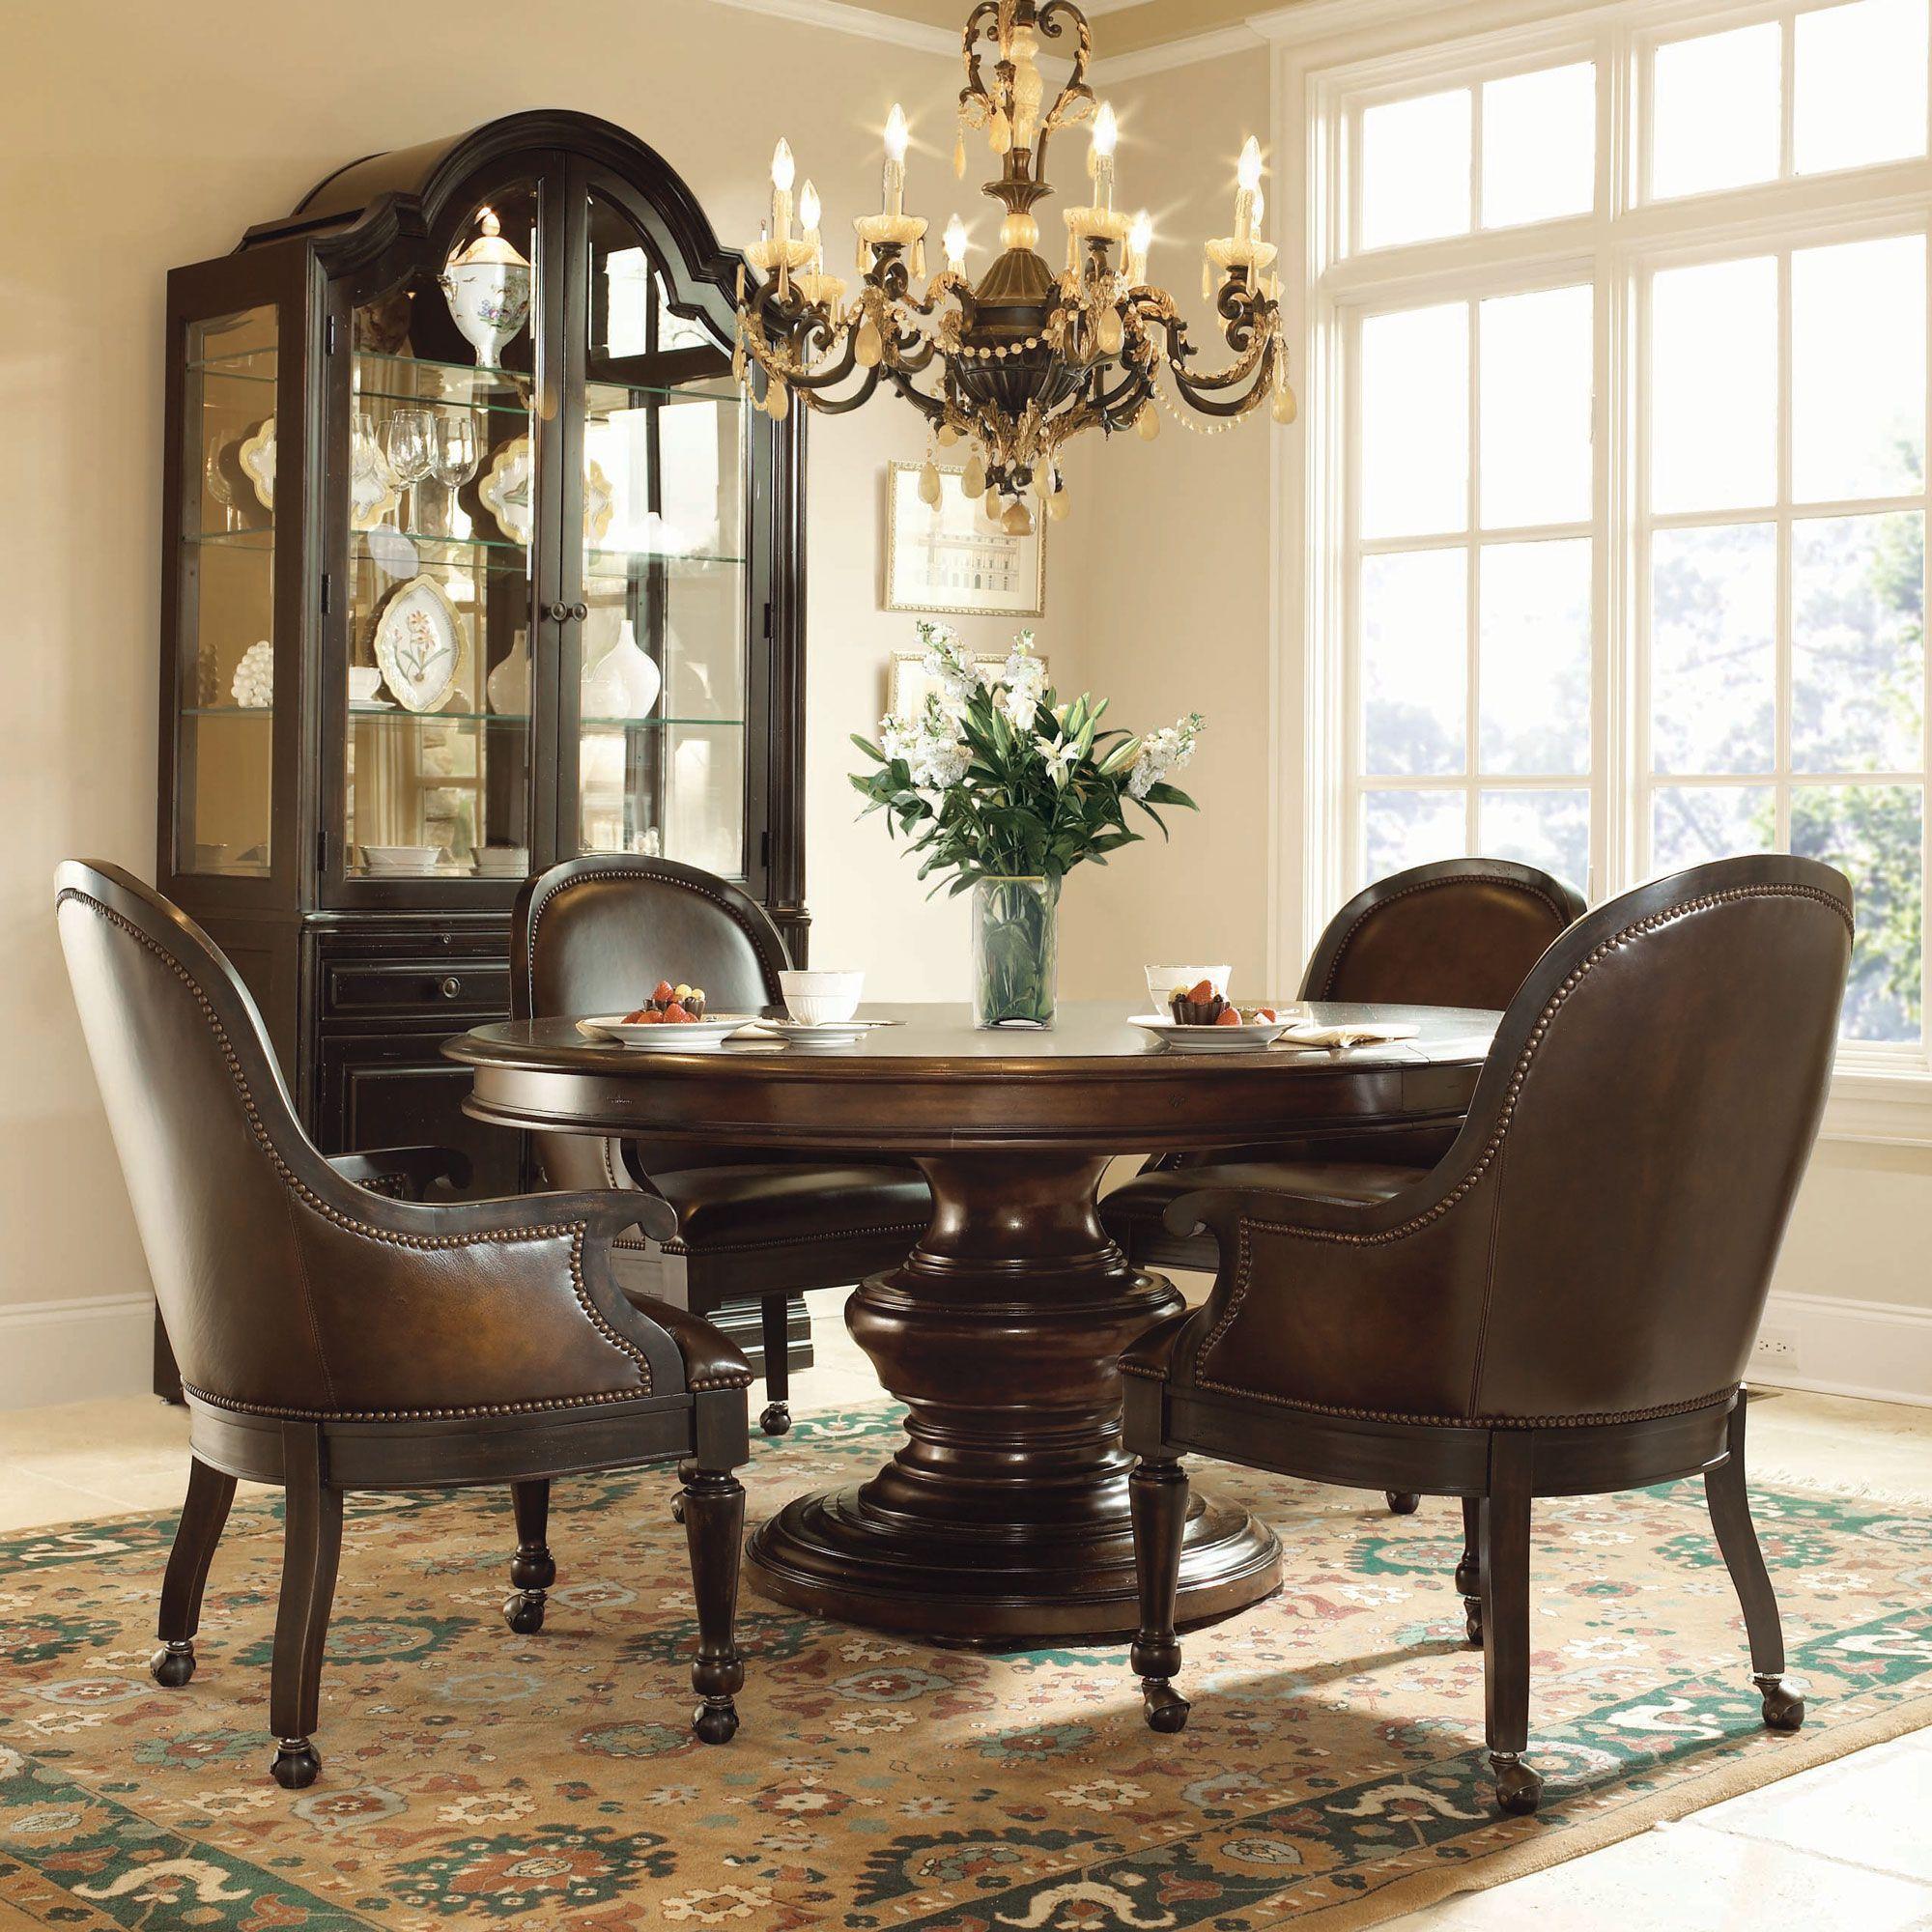 Bernhardt Normandie Manor 5pc Round Dining Room Set with